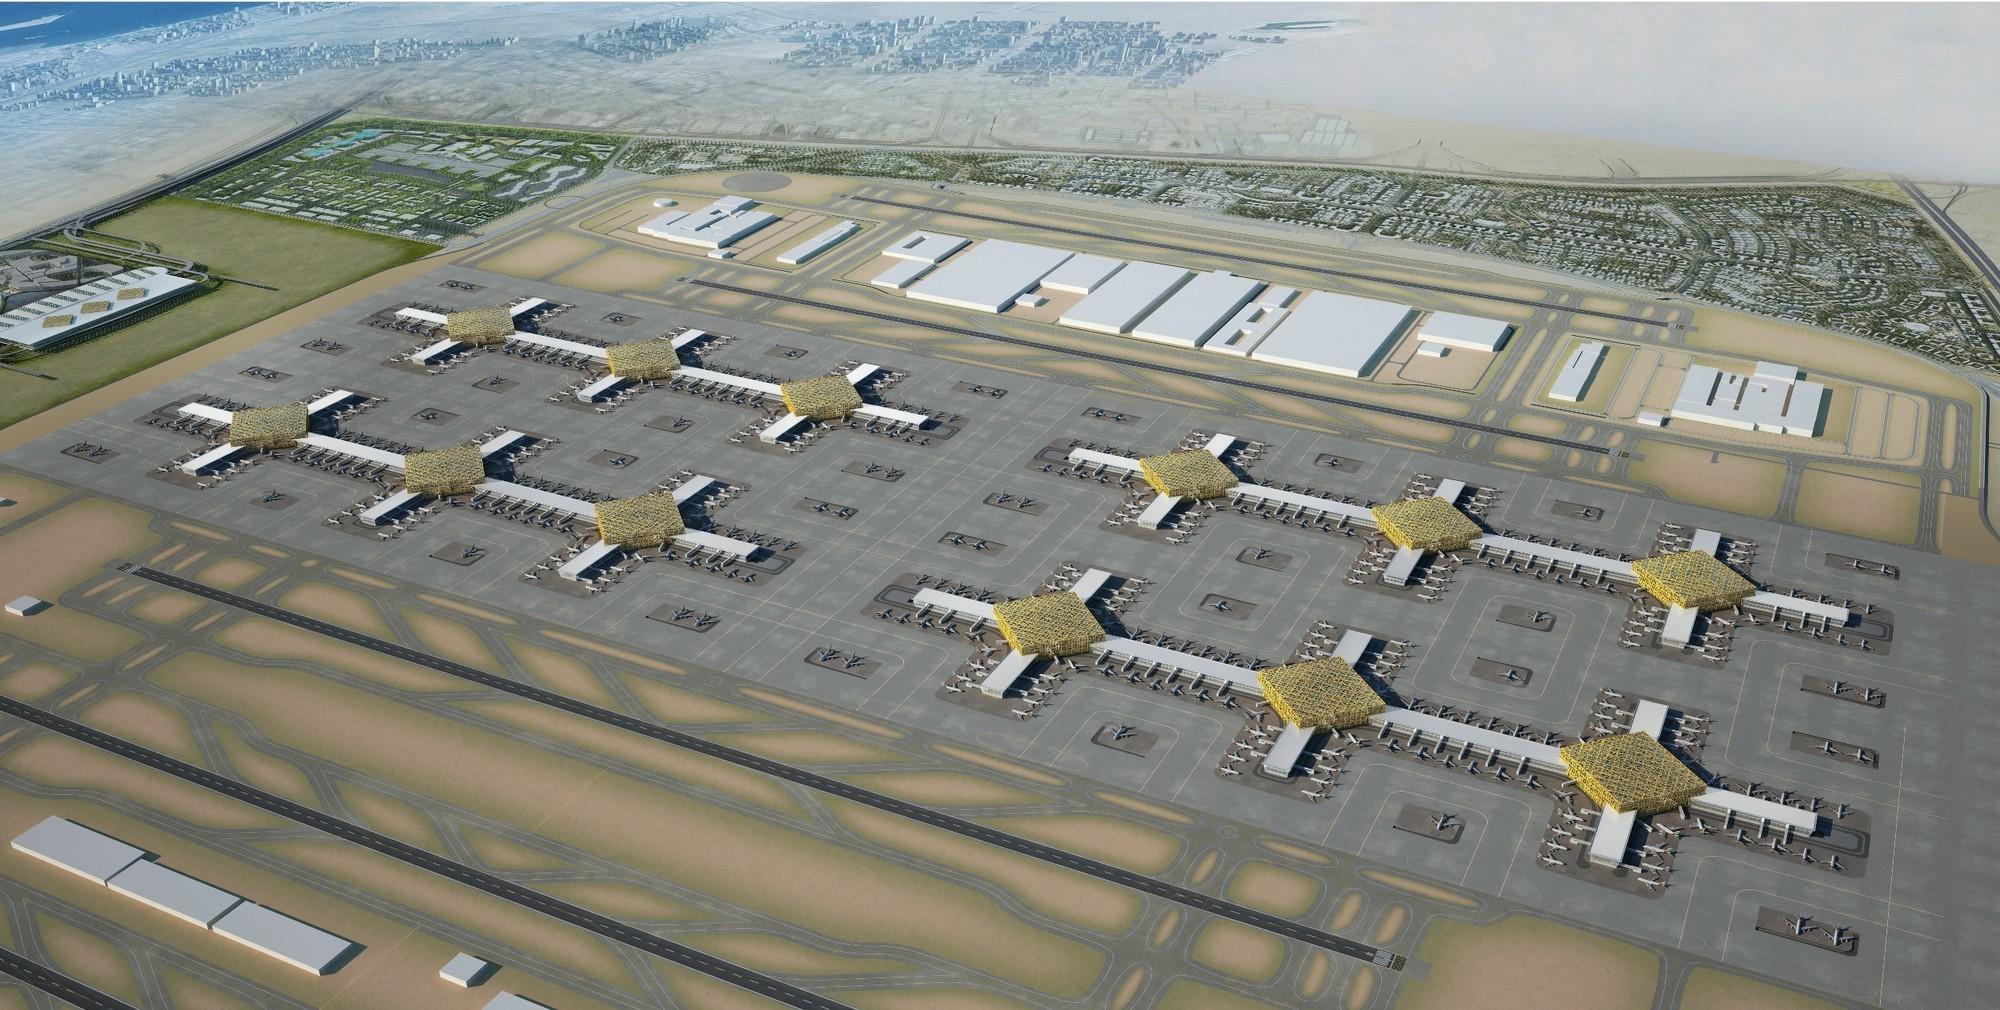 Al Maktoum International Airport, Dubai: World's first purpose-built aerotropolis - Sheet2